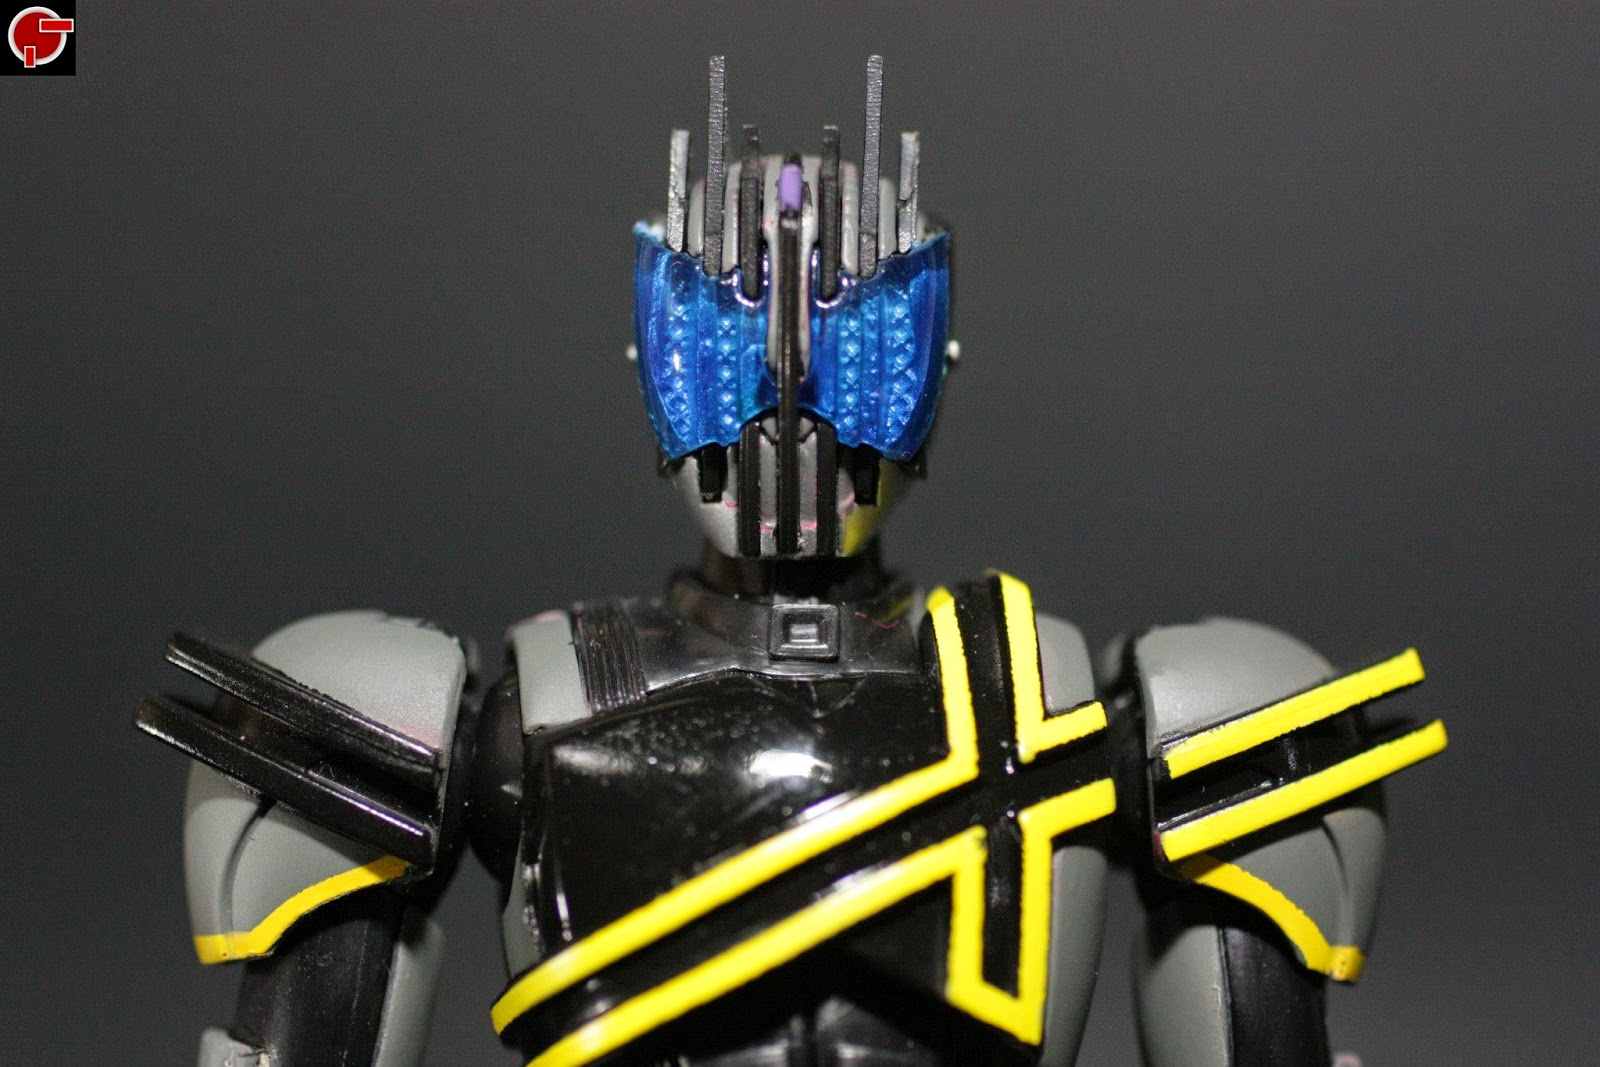 Firestarter's Blog: Toy Review: S.H. Figuarts Kamen Rider ...